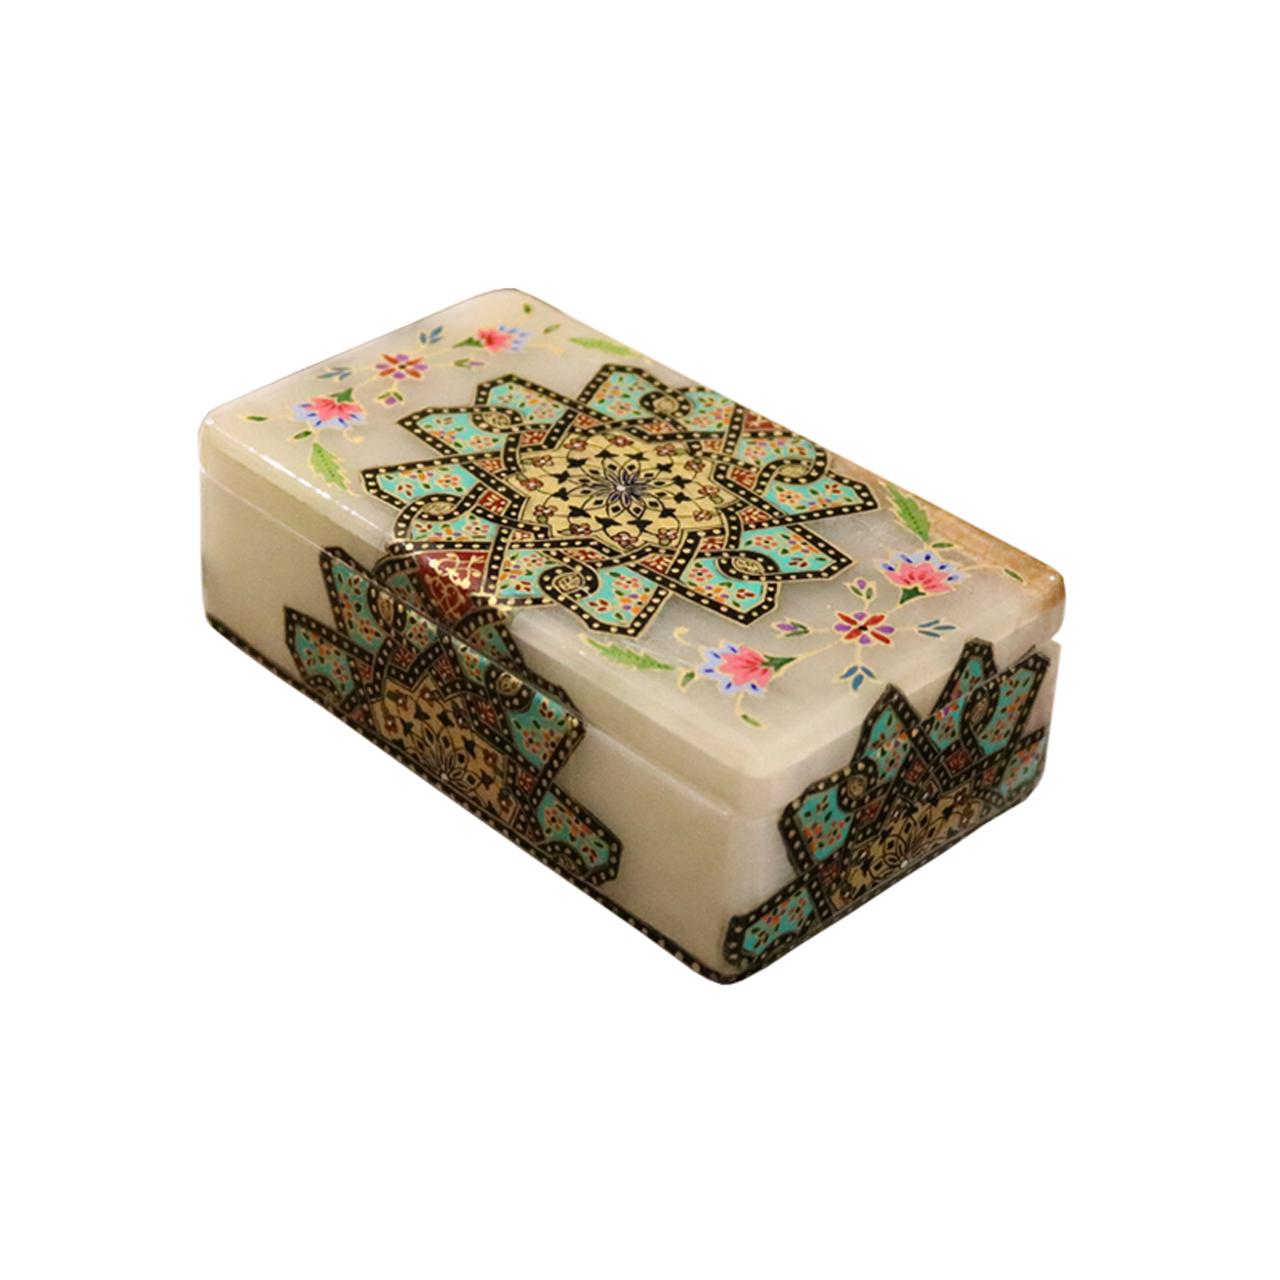 جعبه سنگ مرمر طرح تذهیب کد 127